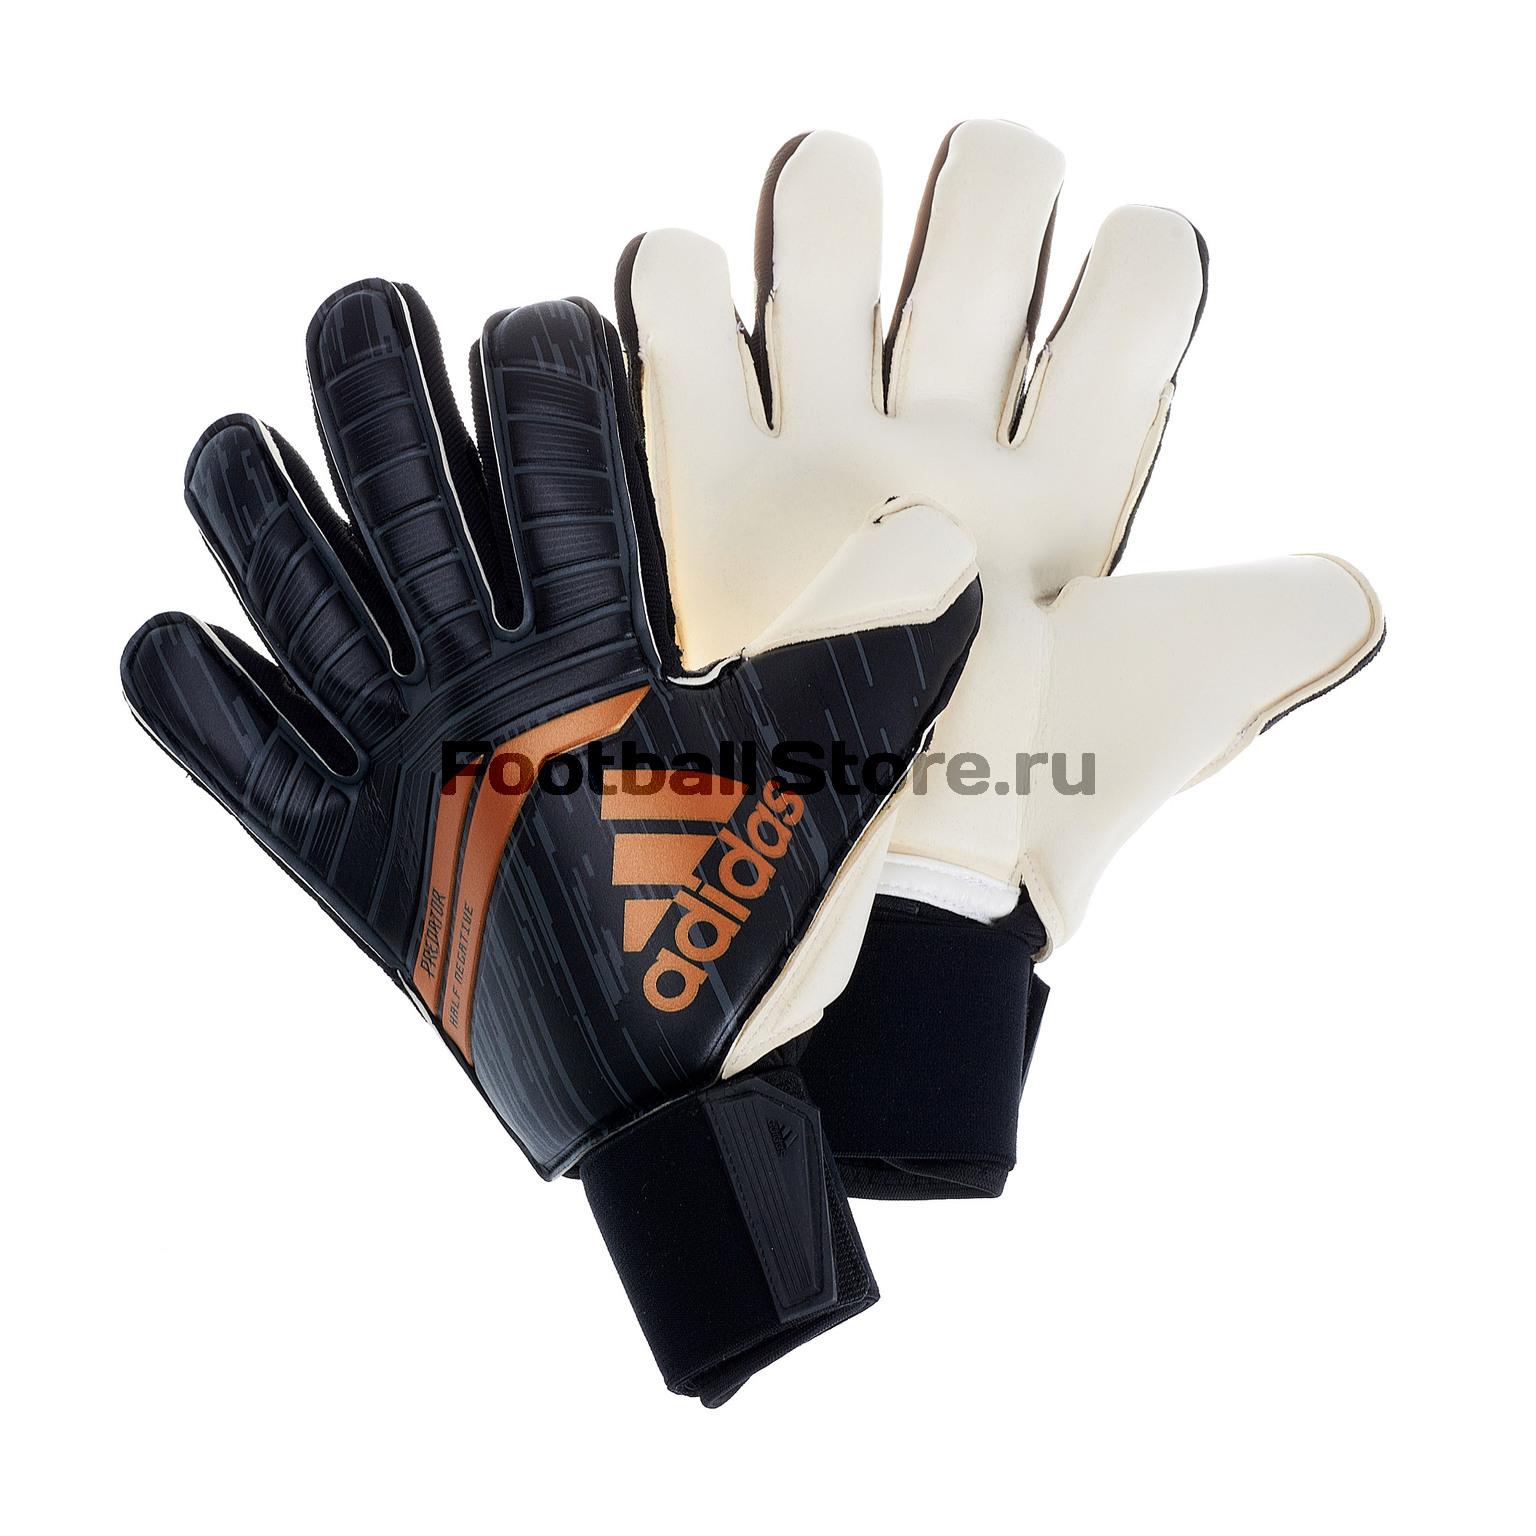 Перчатки вратарские Adidas Pre Half Neg CF1356 перчатки вратарские adidas ace half neg az3688